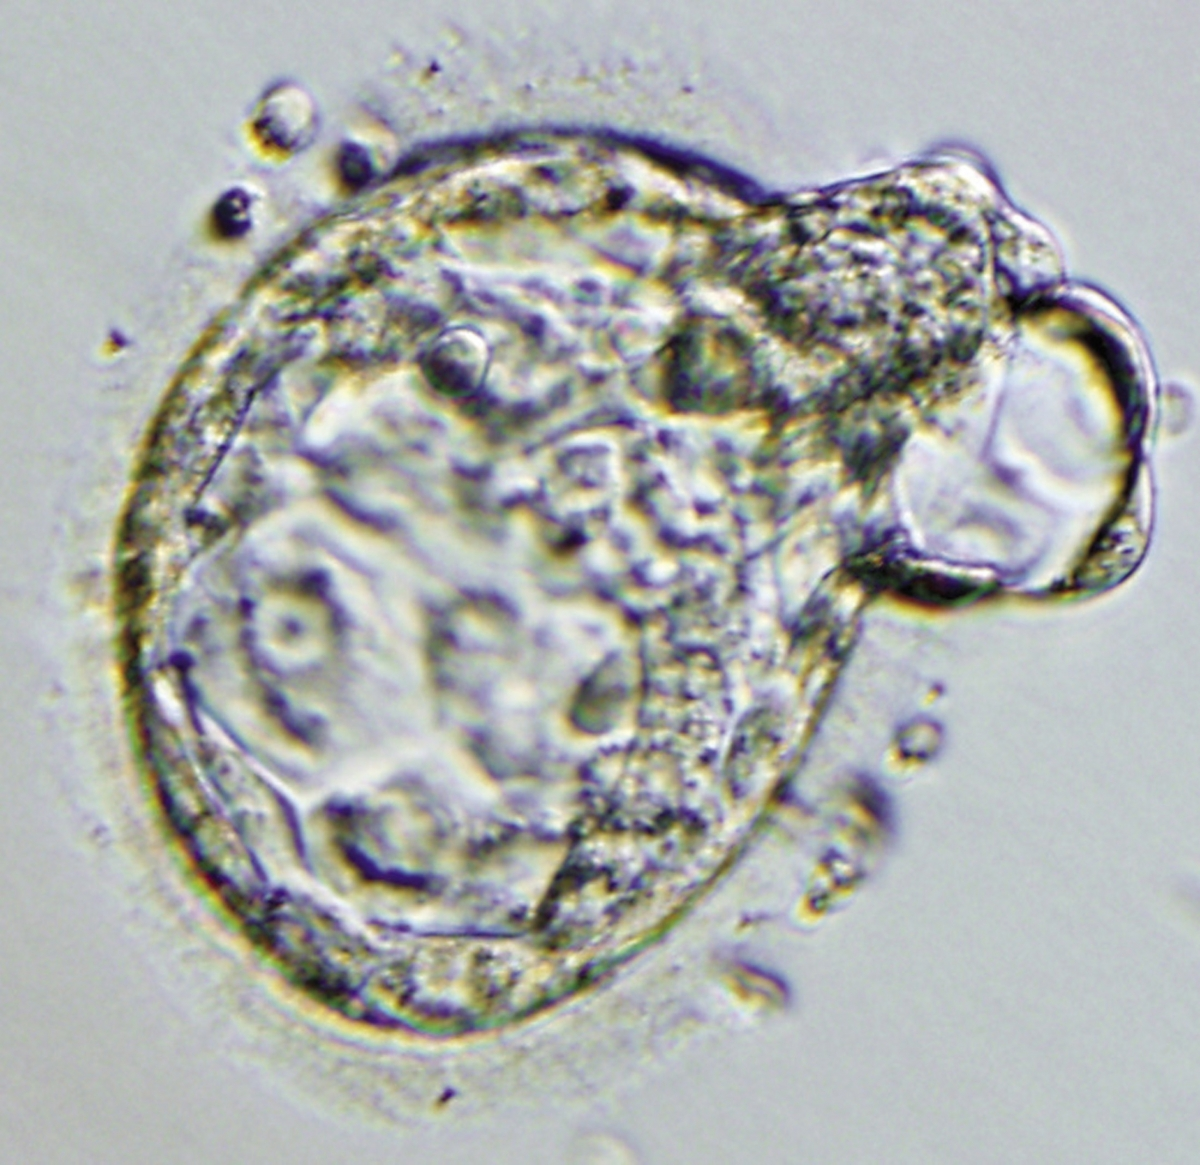 Human embryo